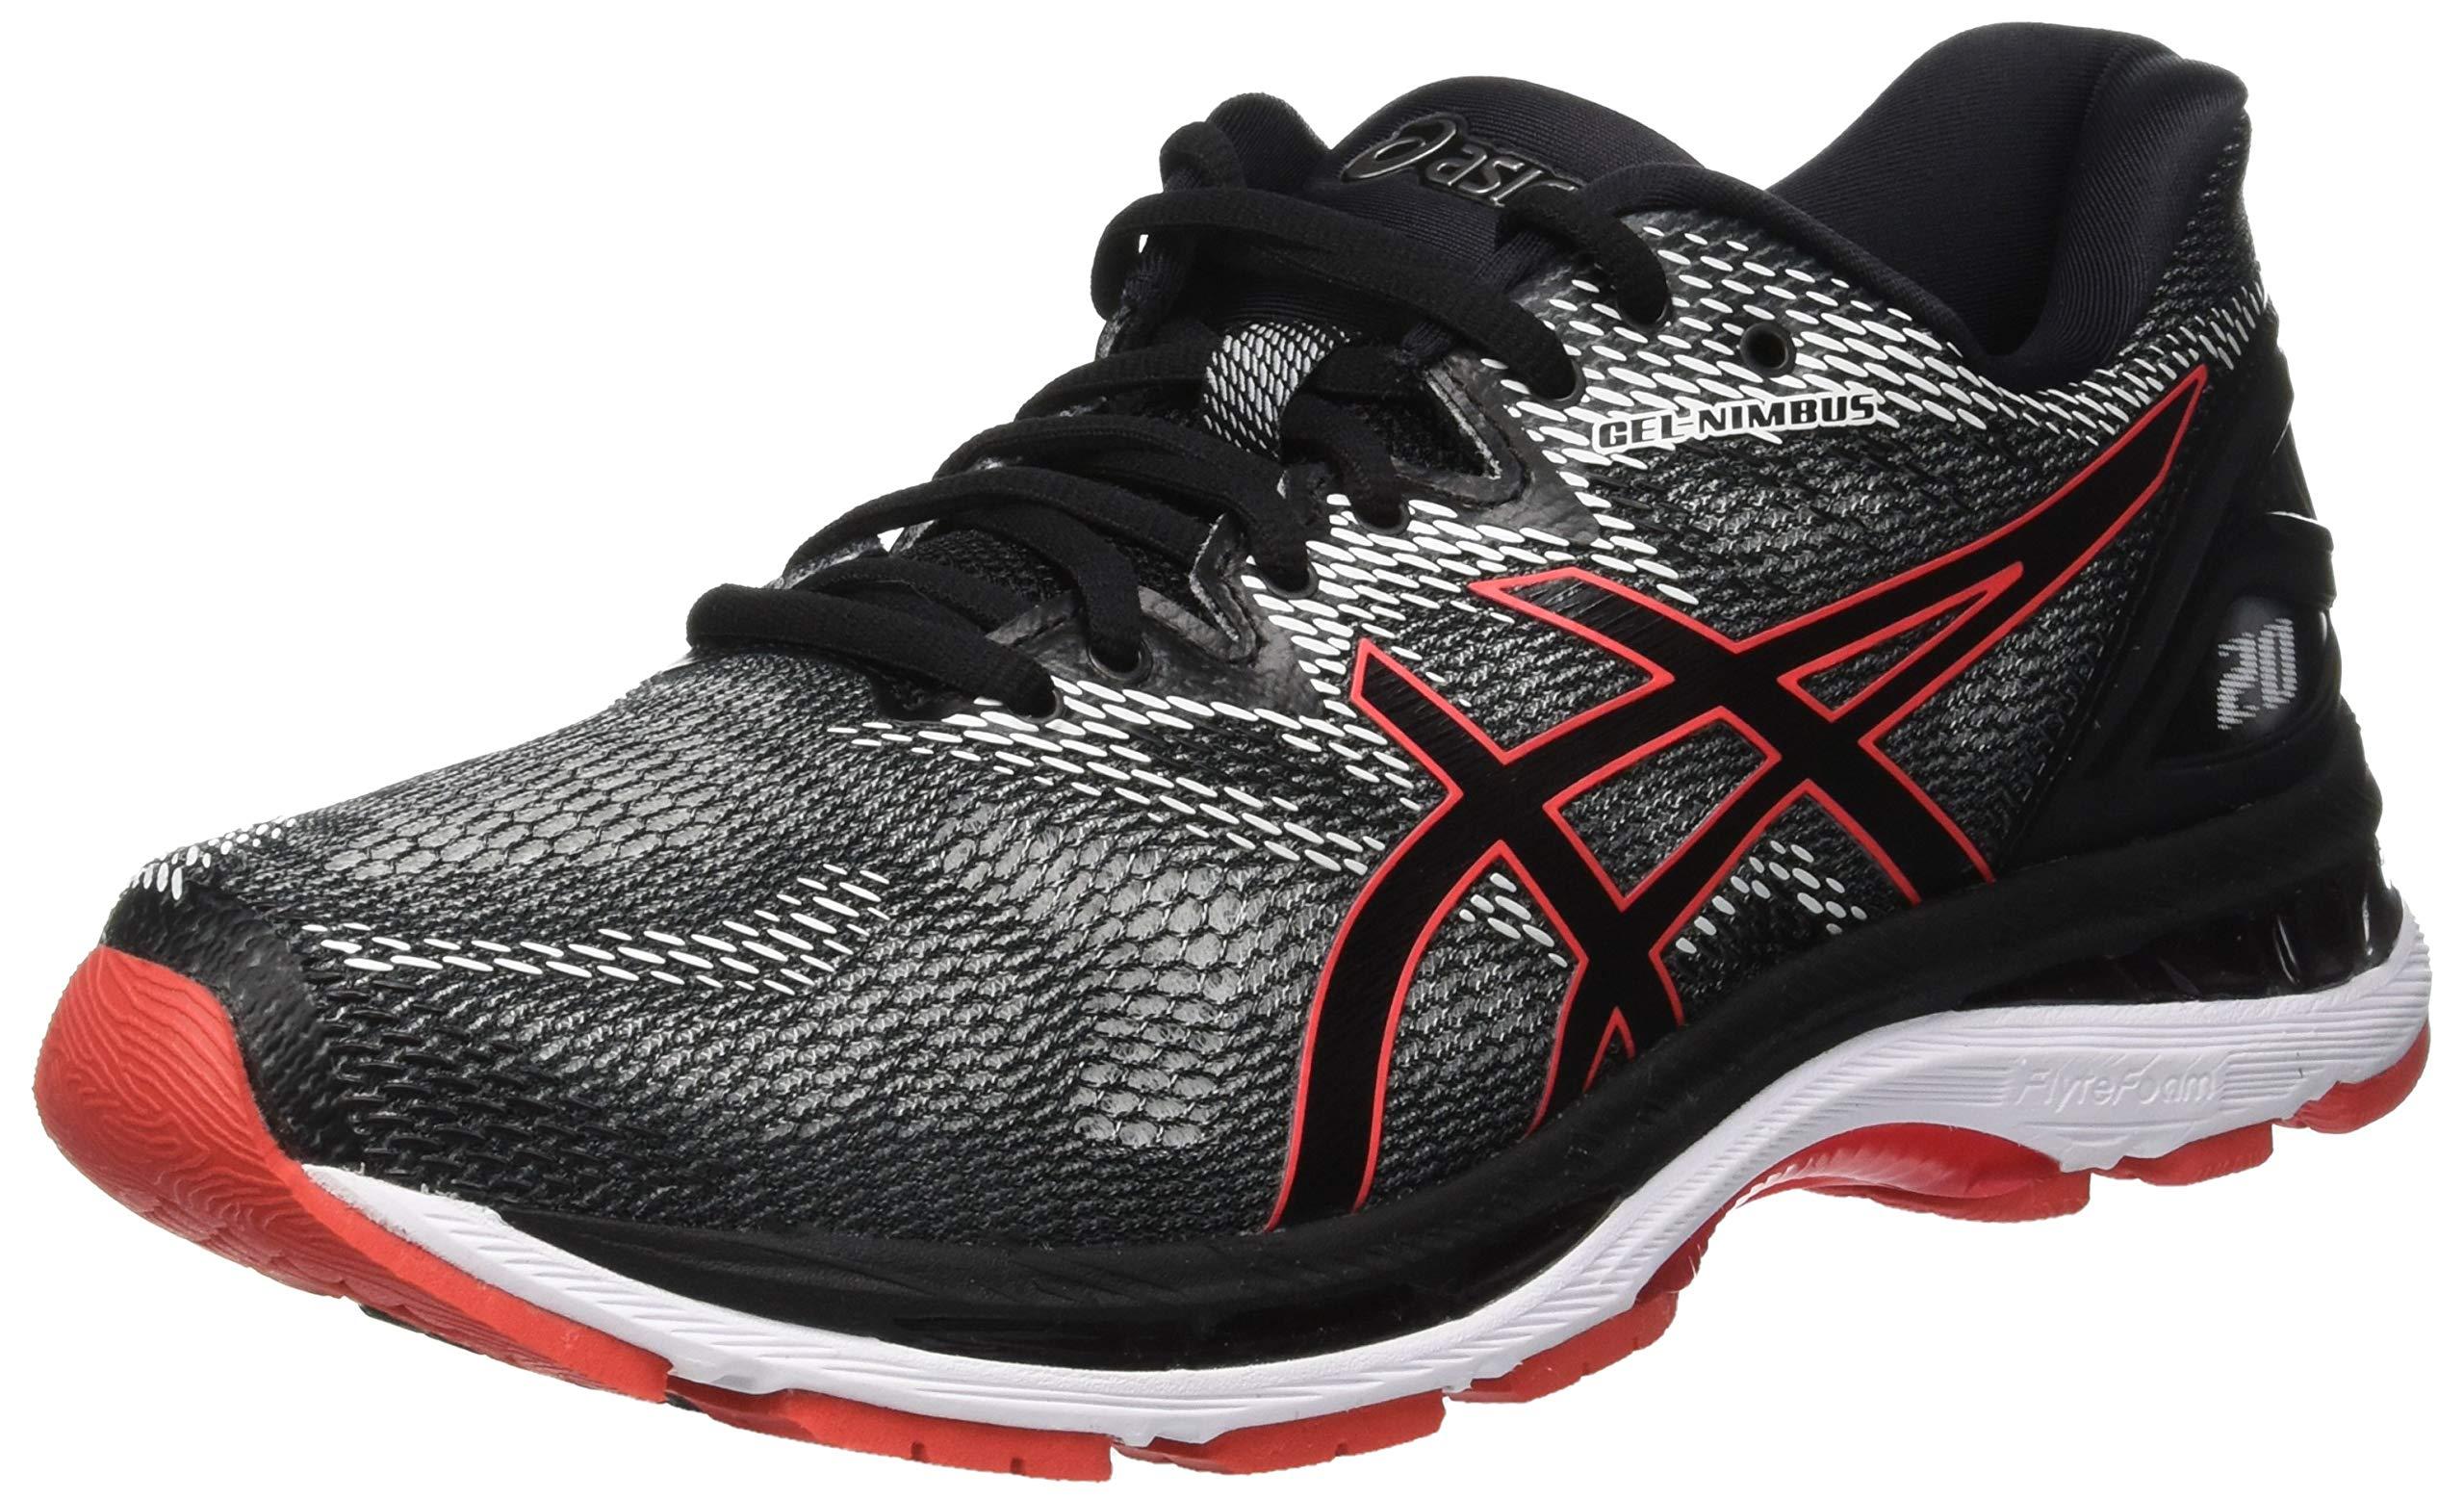 60a4ef1e301 Top Chaussures de running selon les notes Amazon.fr